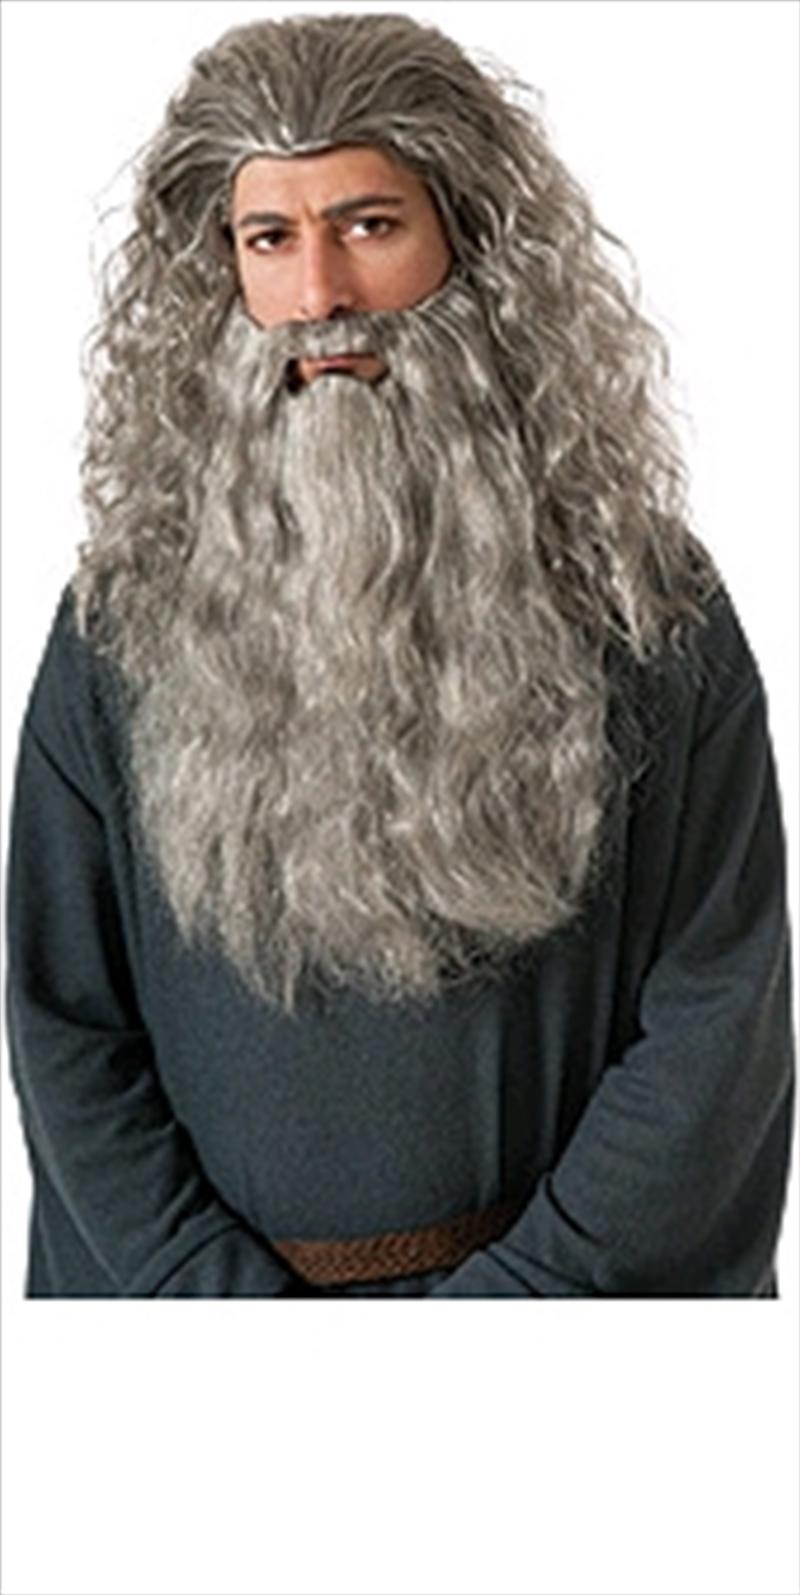 Gandalf Beard Kit | Apparel